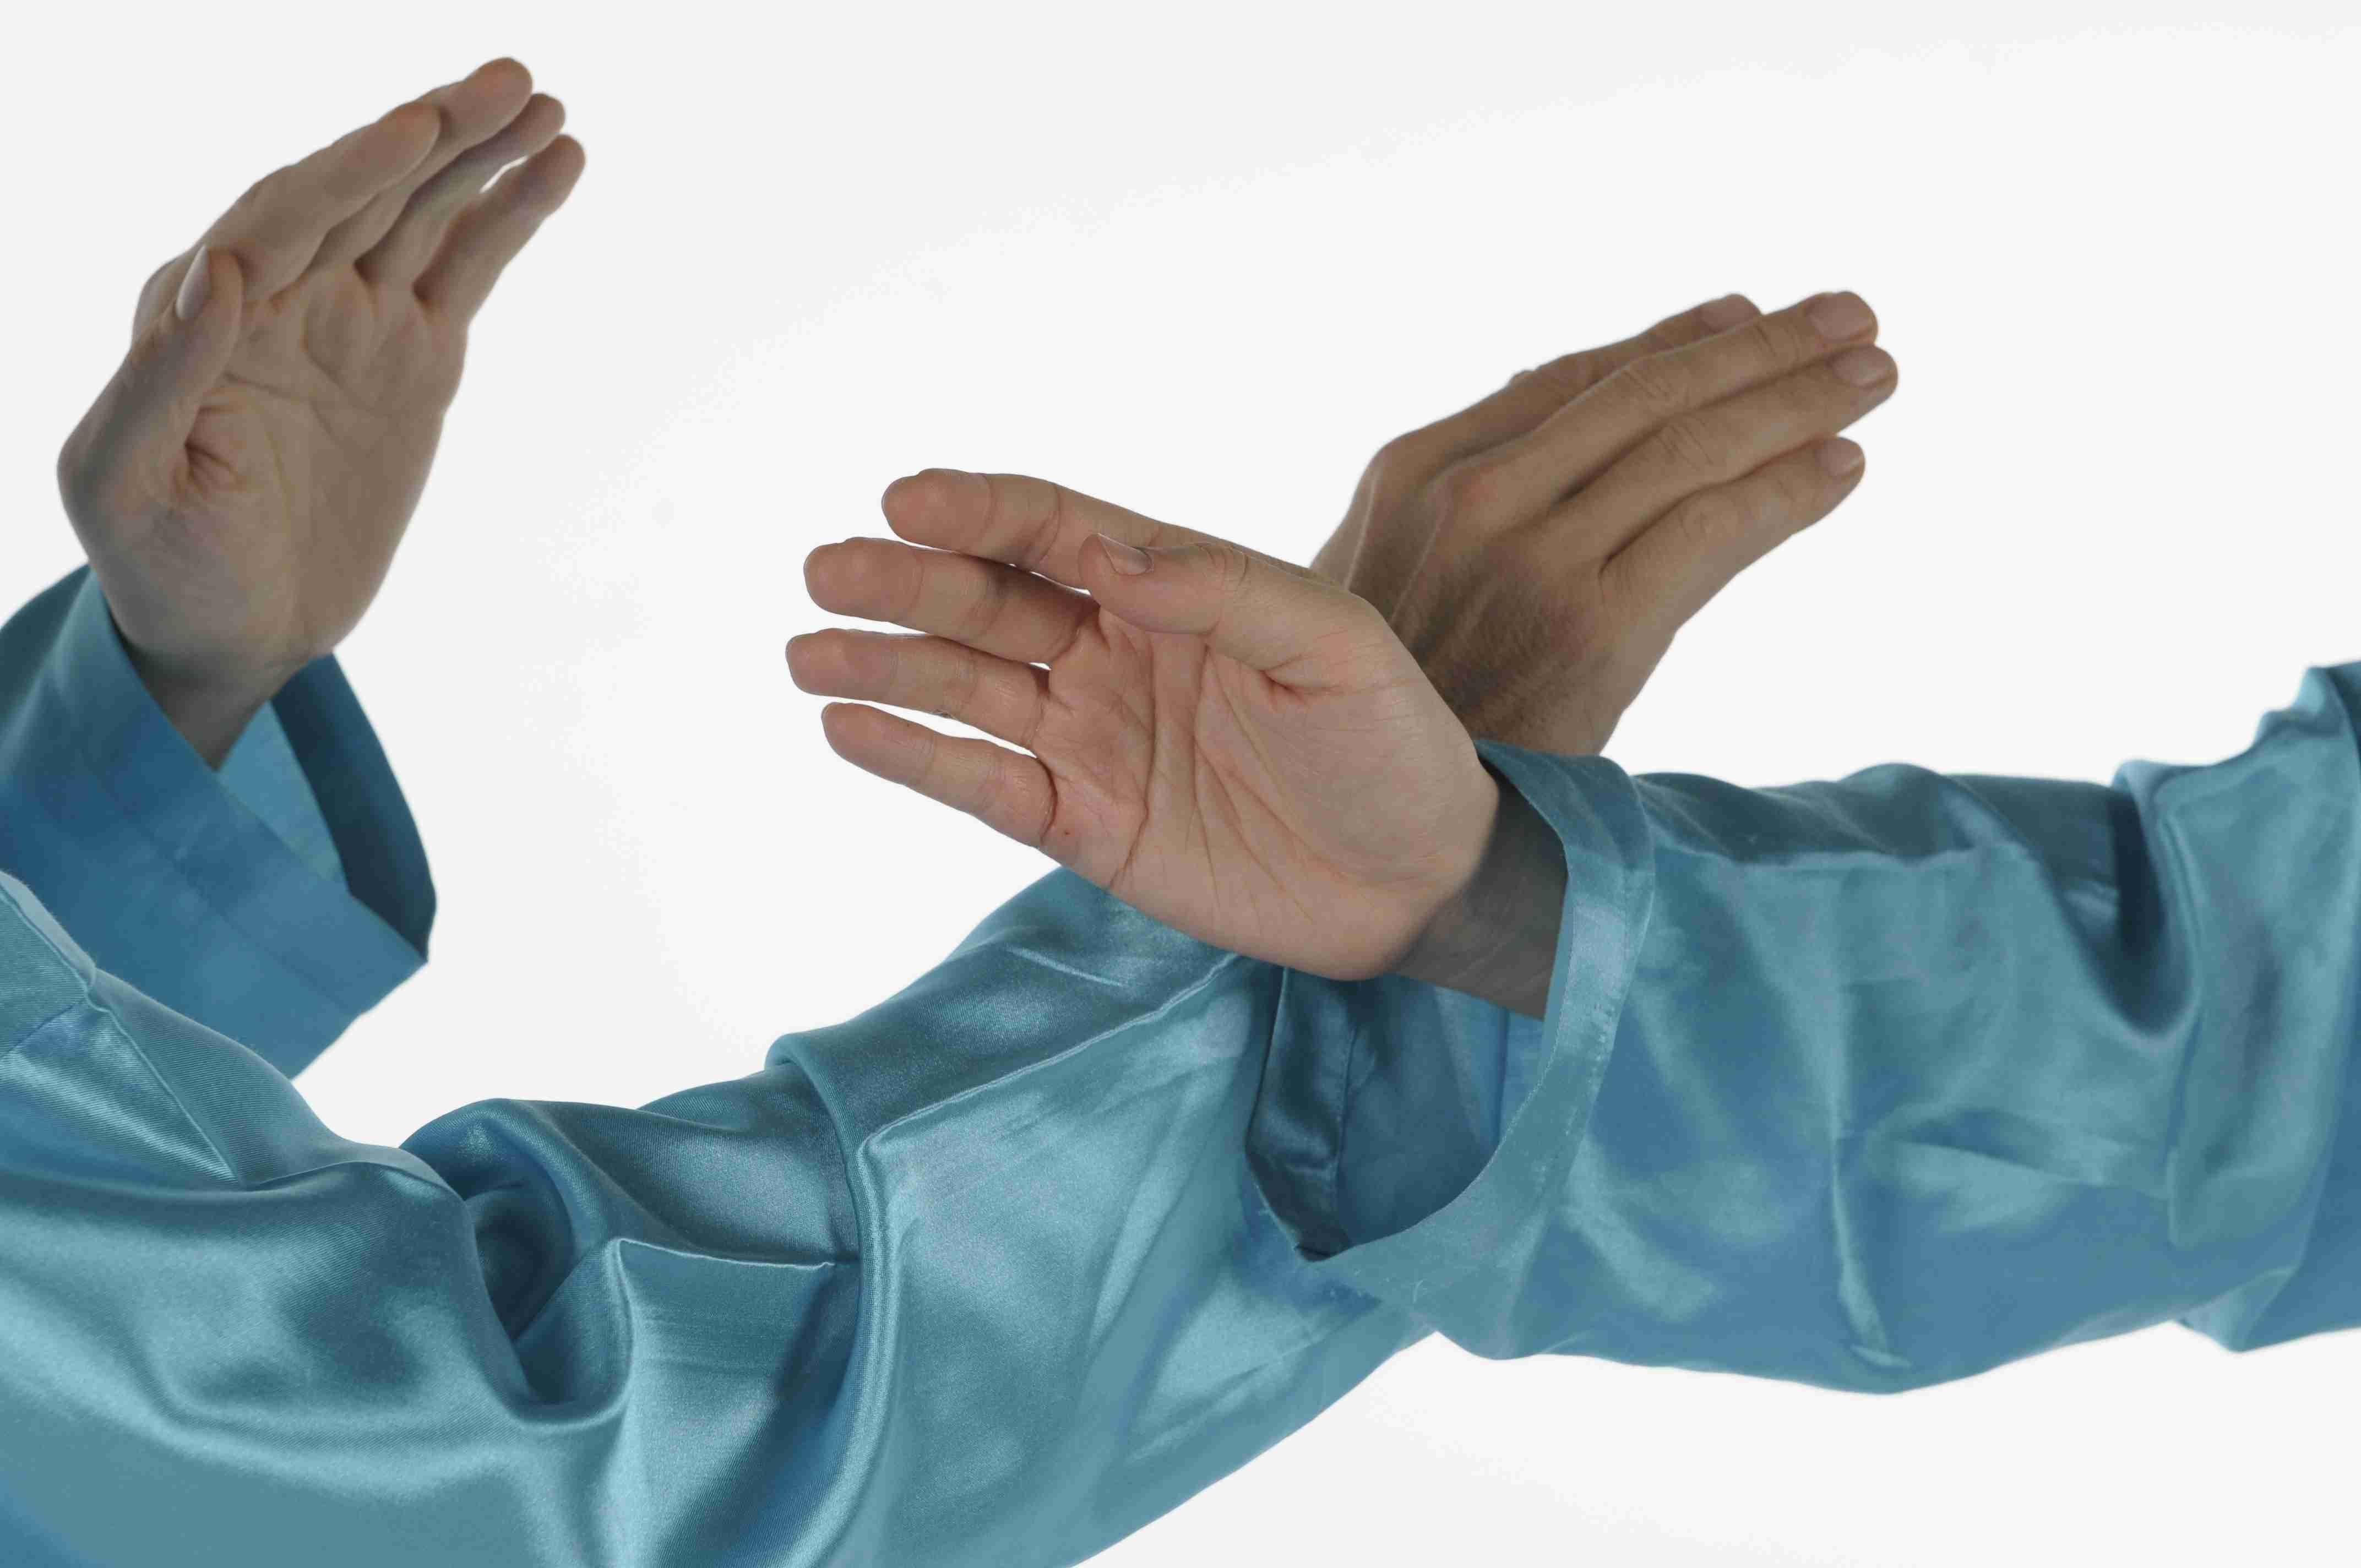 Tai Chi Hands | Tai Chi | Tai chi qigong, Tai chi, Qigong